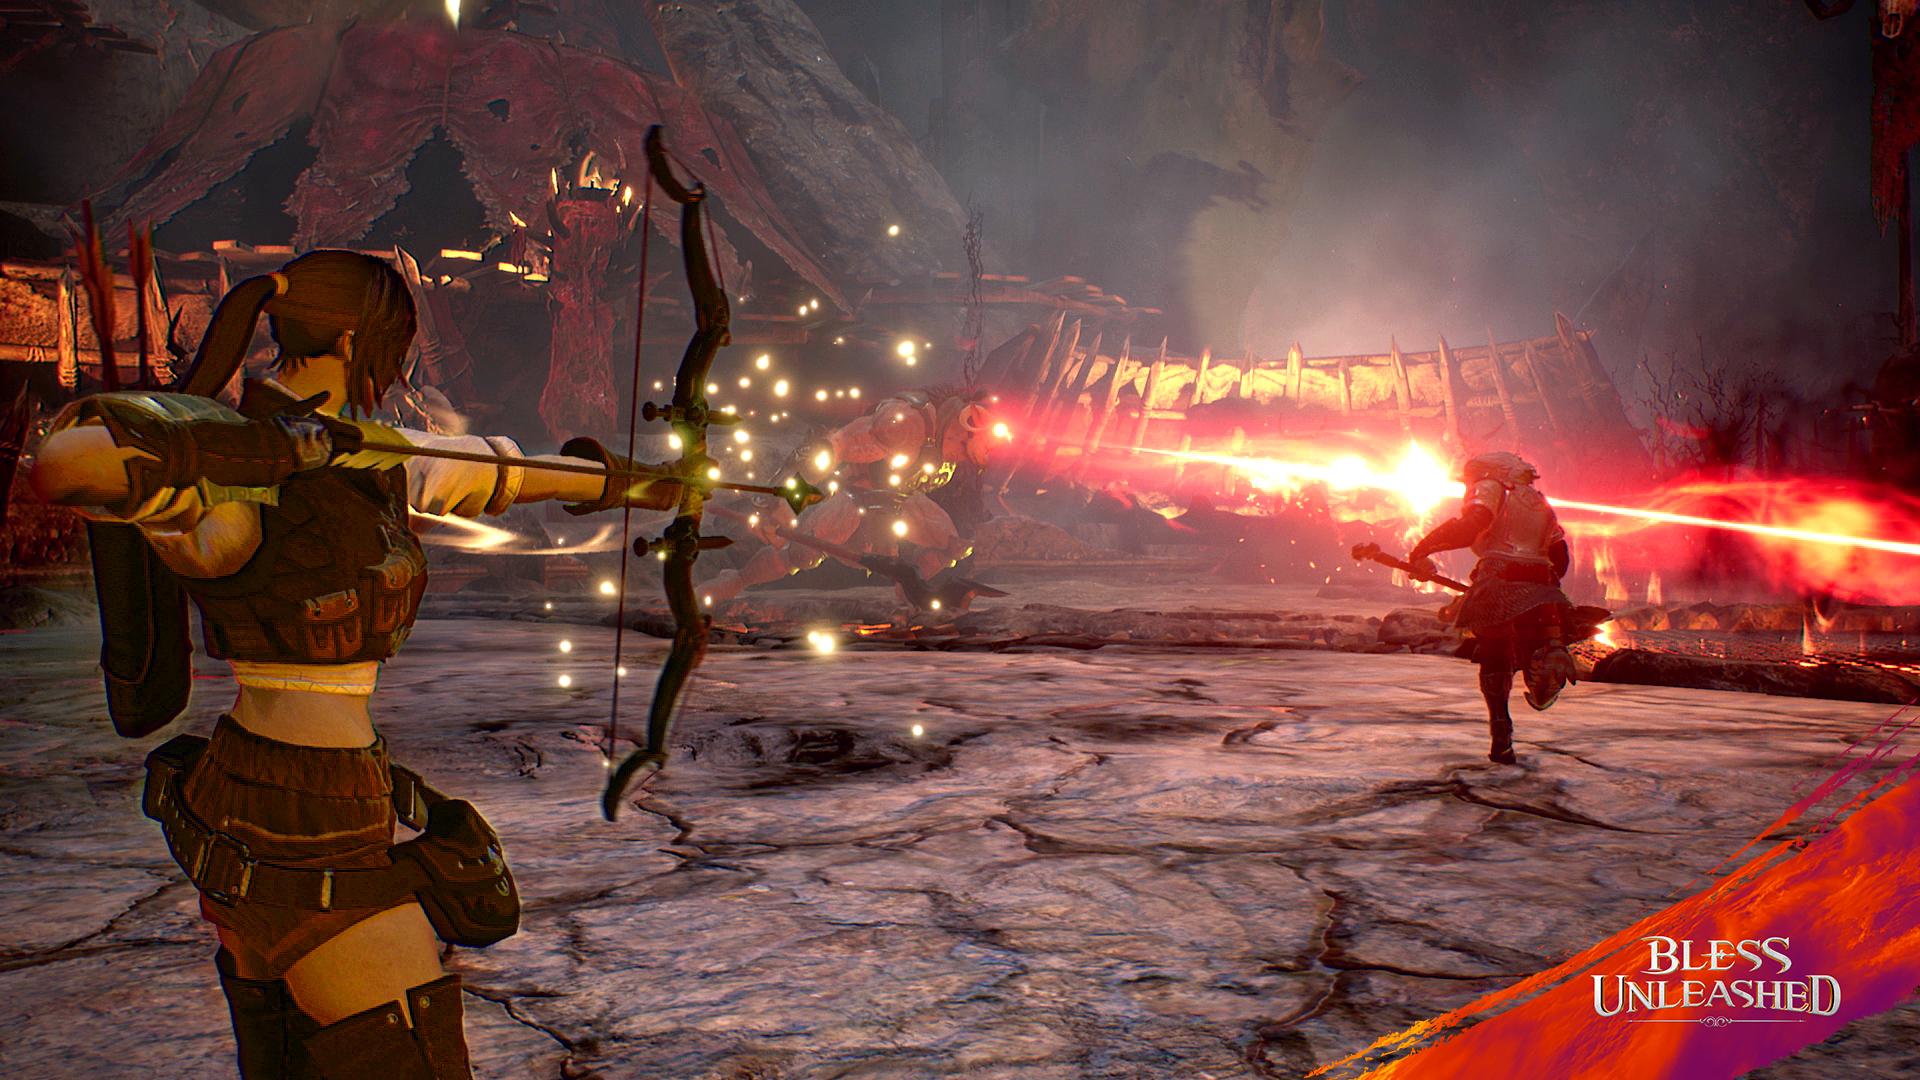 Bandai Namco анонсировала Bless Unleashed — консольную MMO для Xbox One